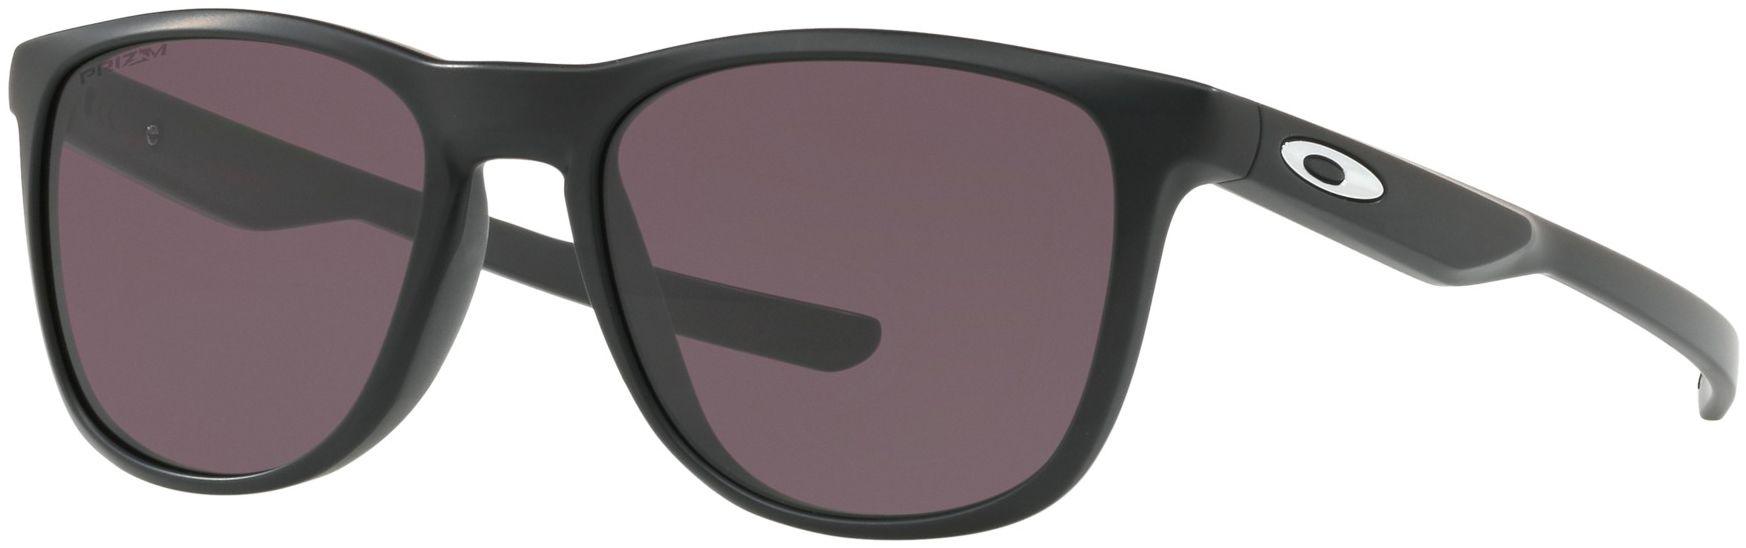 4fdca37985 Oakley Trillbe X Prizm Grey Mens Sunglasses - OO9340-1252